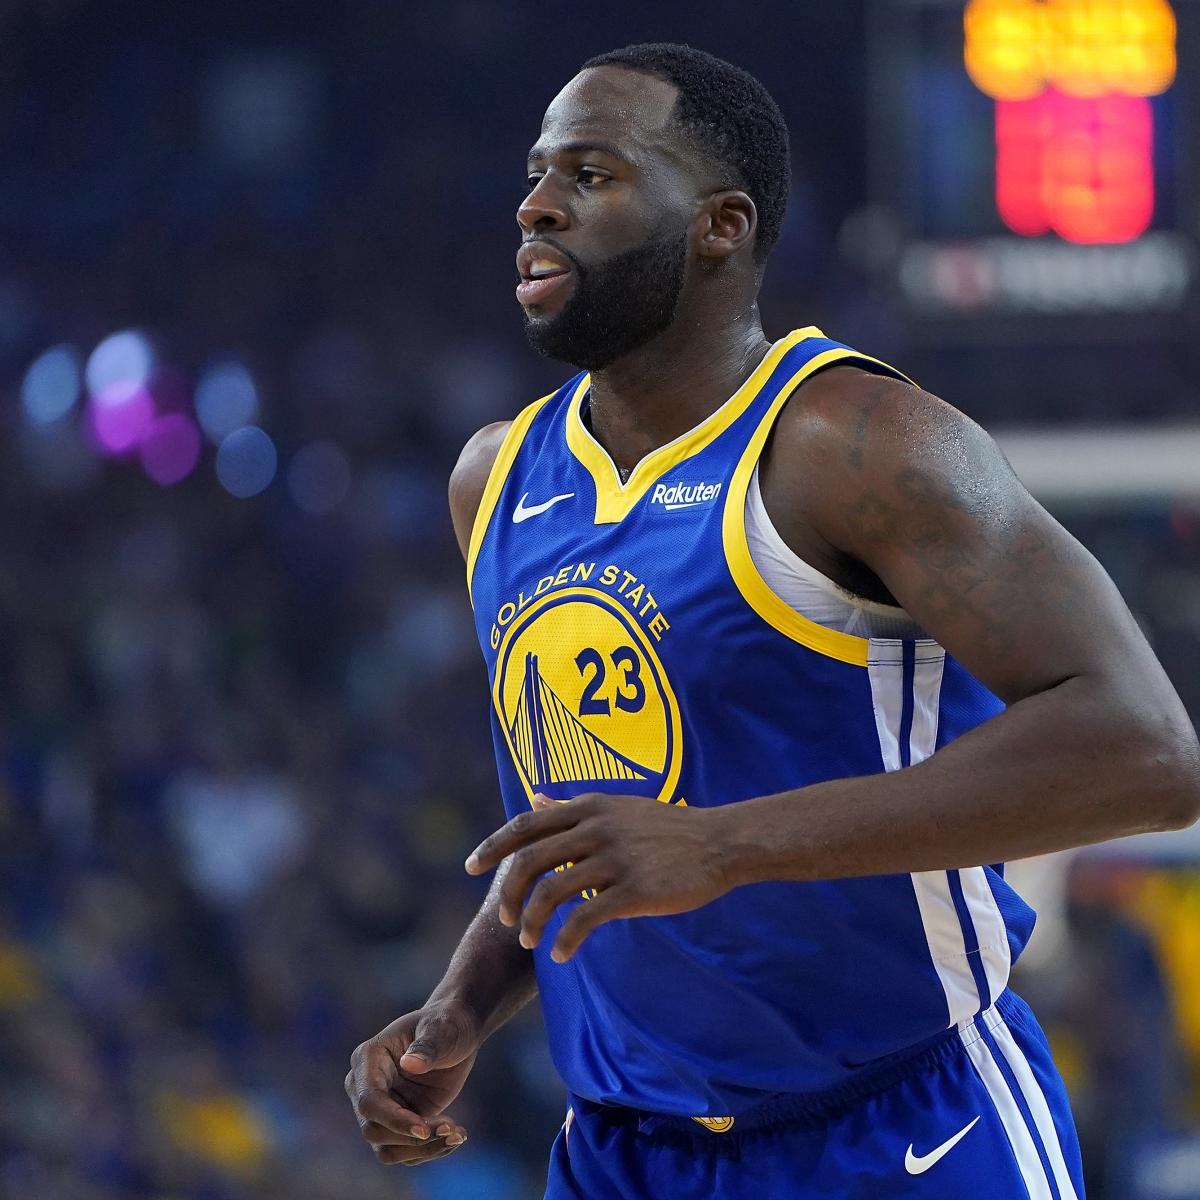 Warriors Vs Nets Full Game Highlights: Warriors Rumors: Draymond Green To Return From Foot Injury